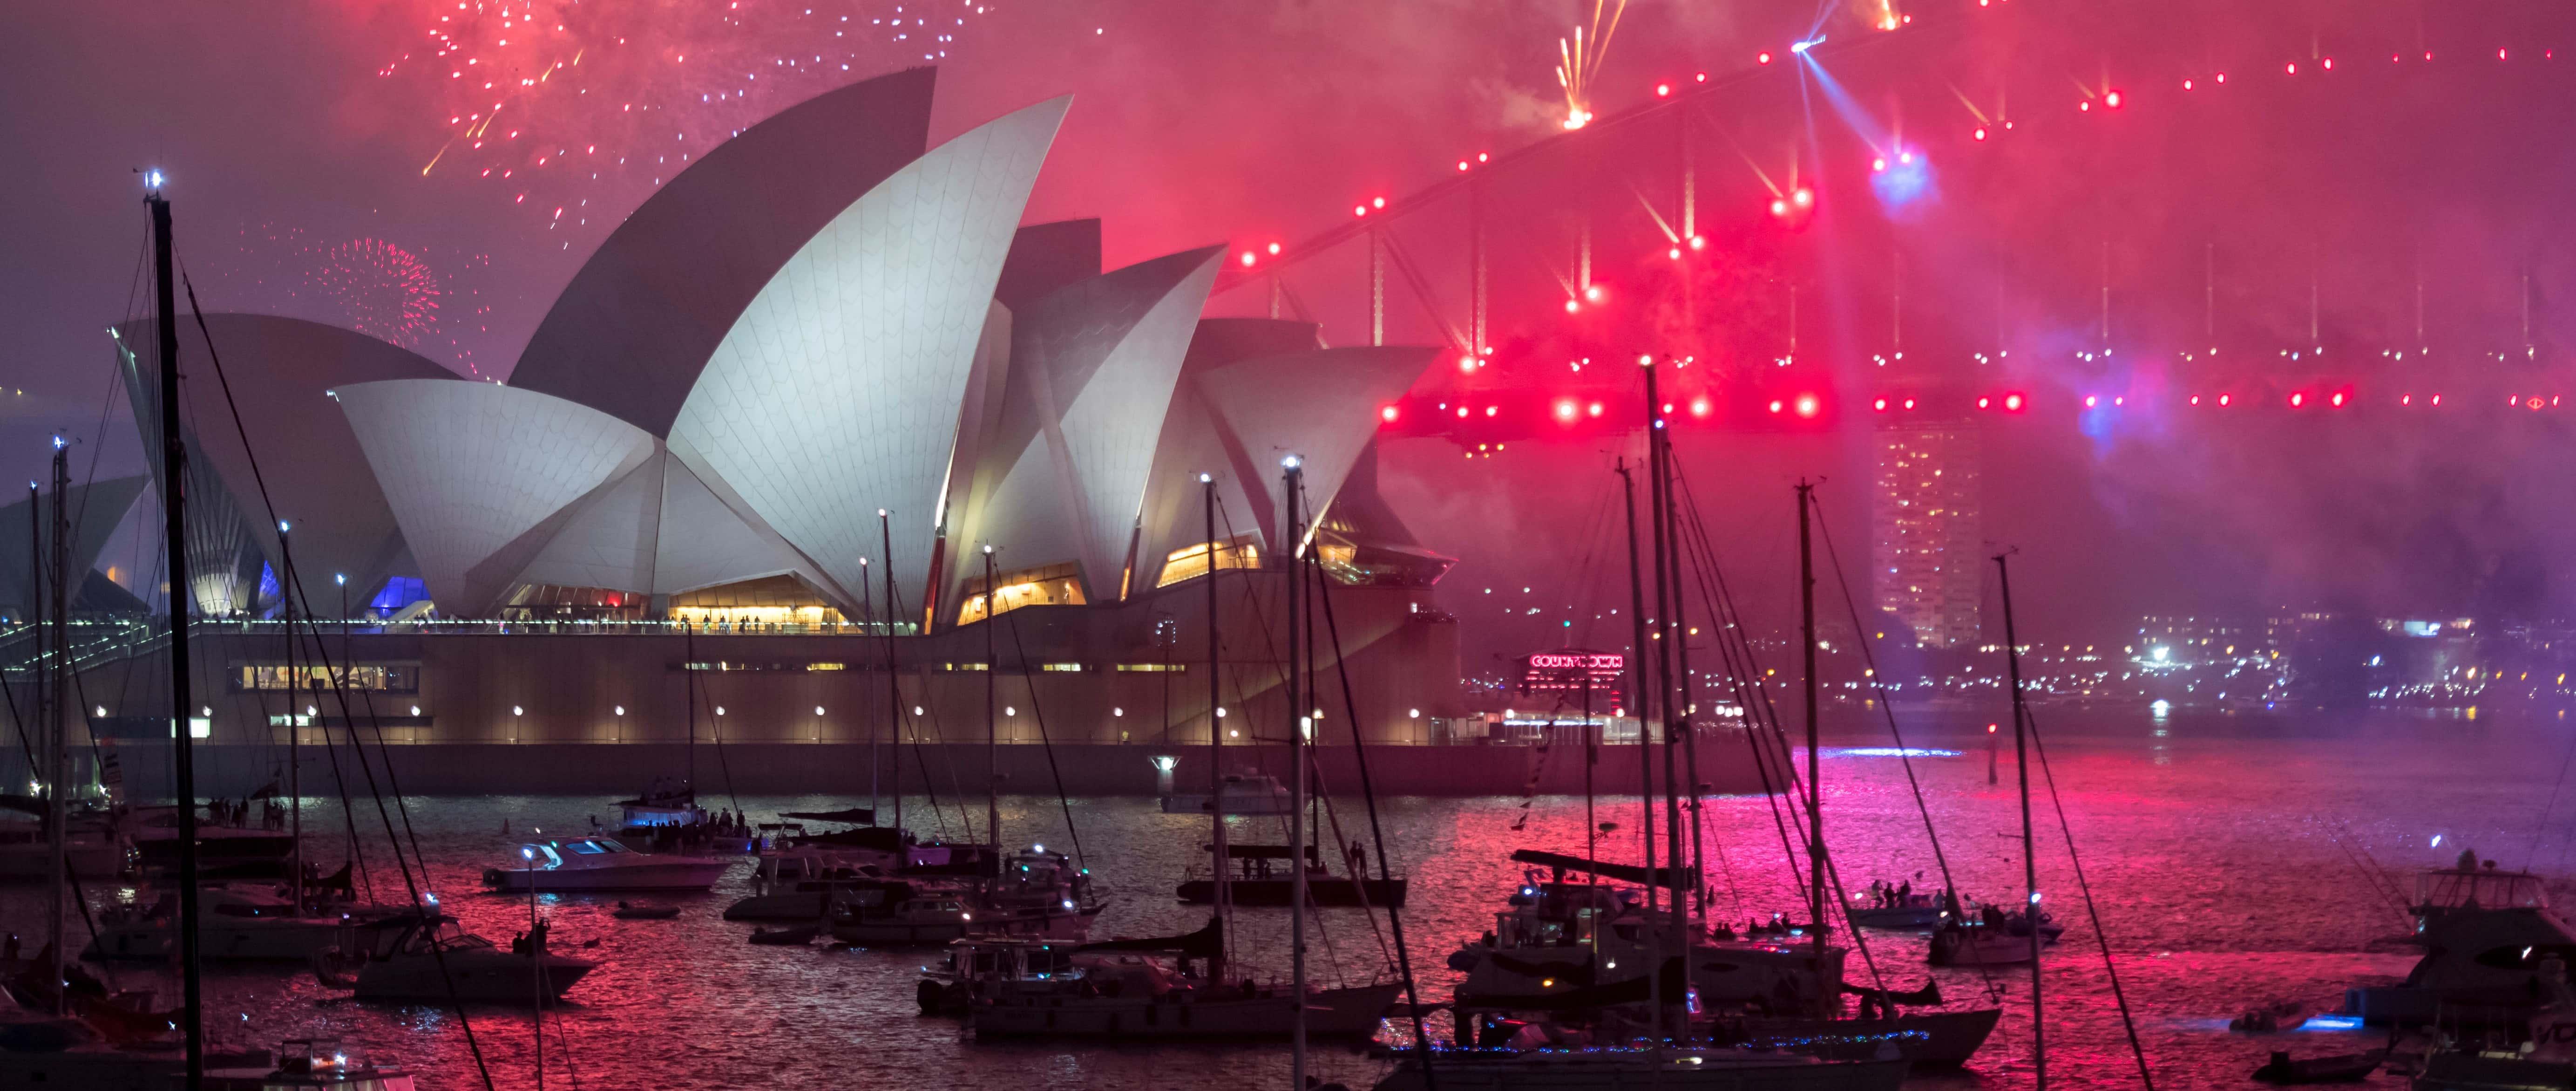 Sydney, 1 January 2018 (Photo: D. Morgan/Getty)